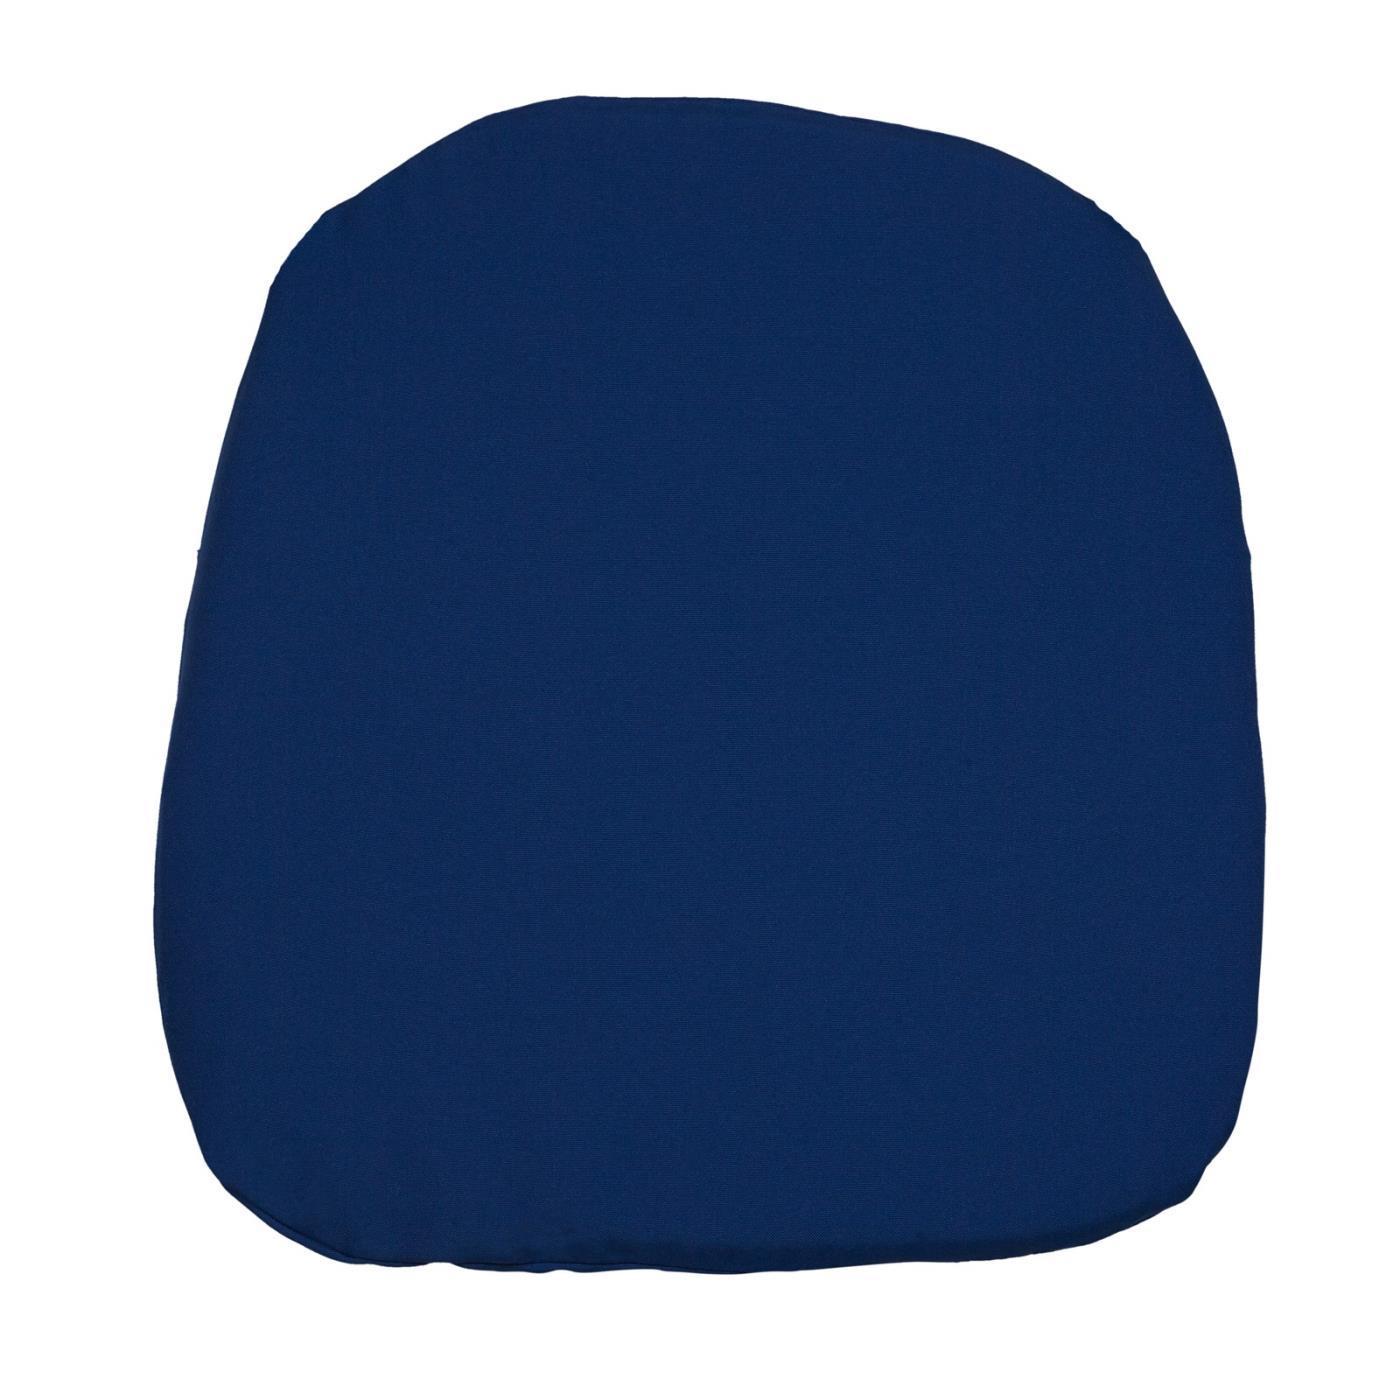 Poly Seat Cushion - Royal Blue